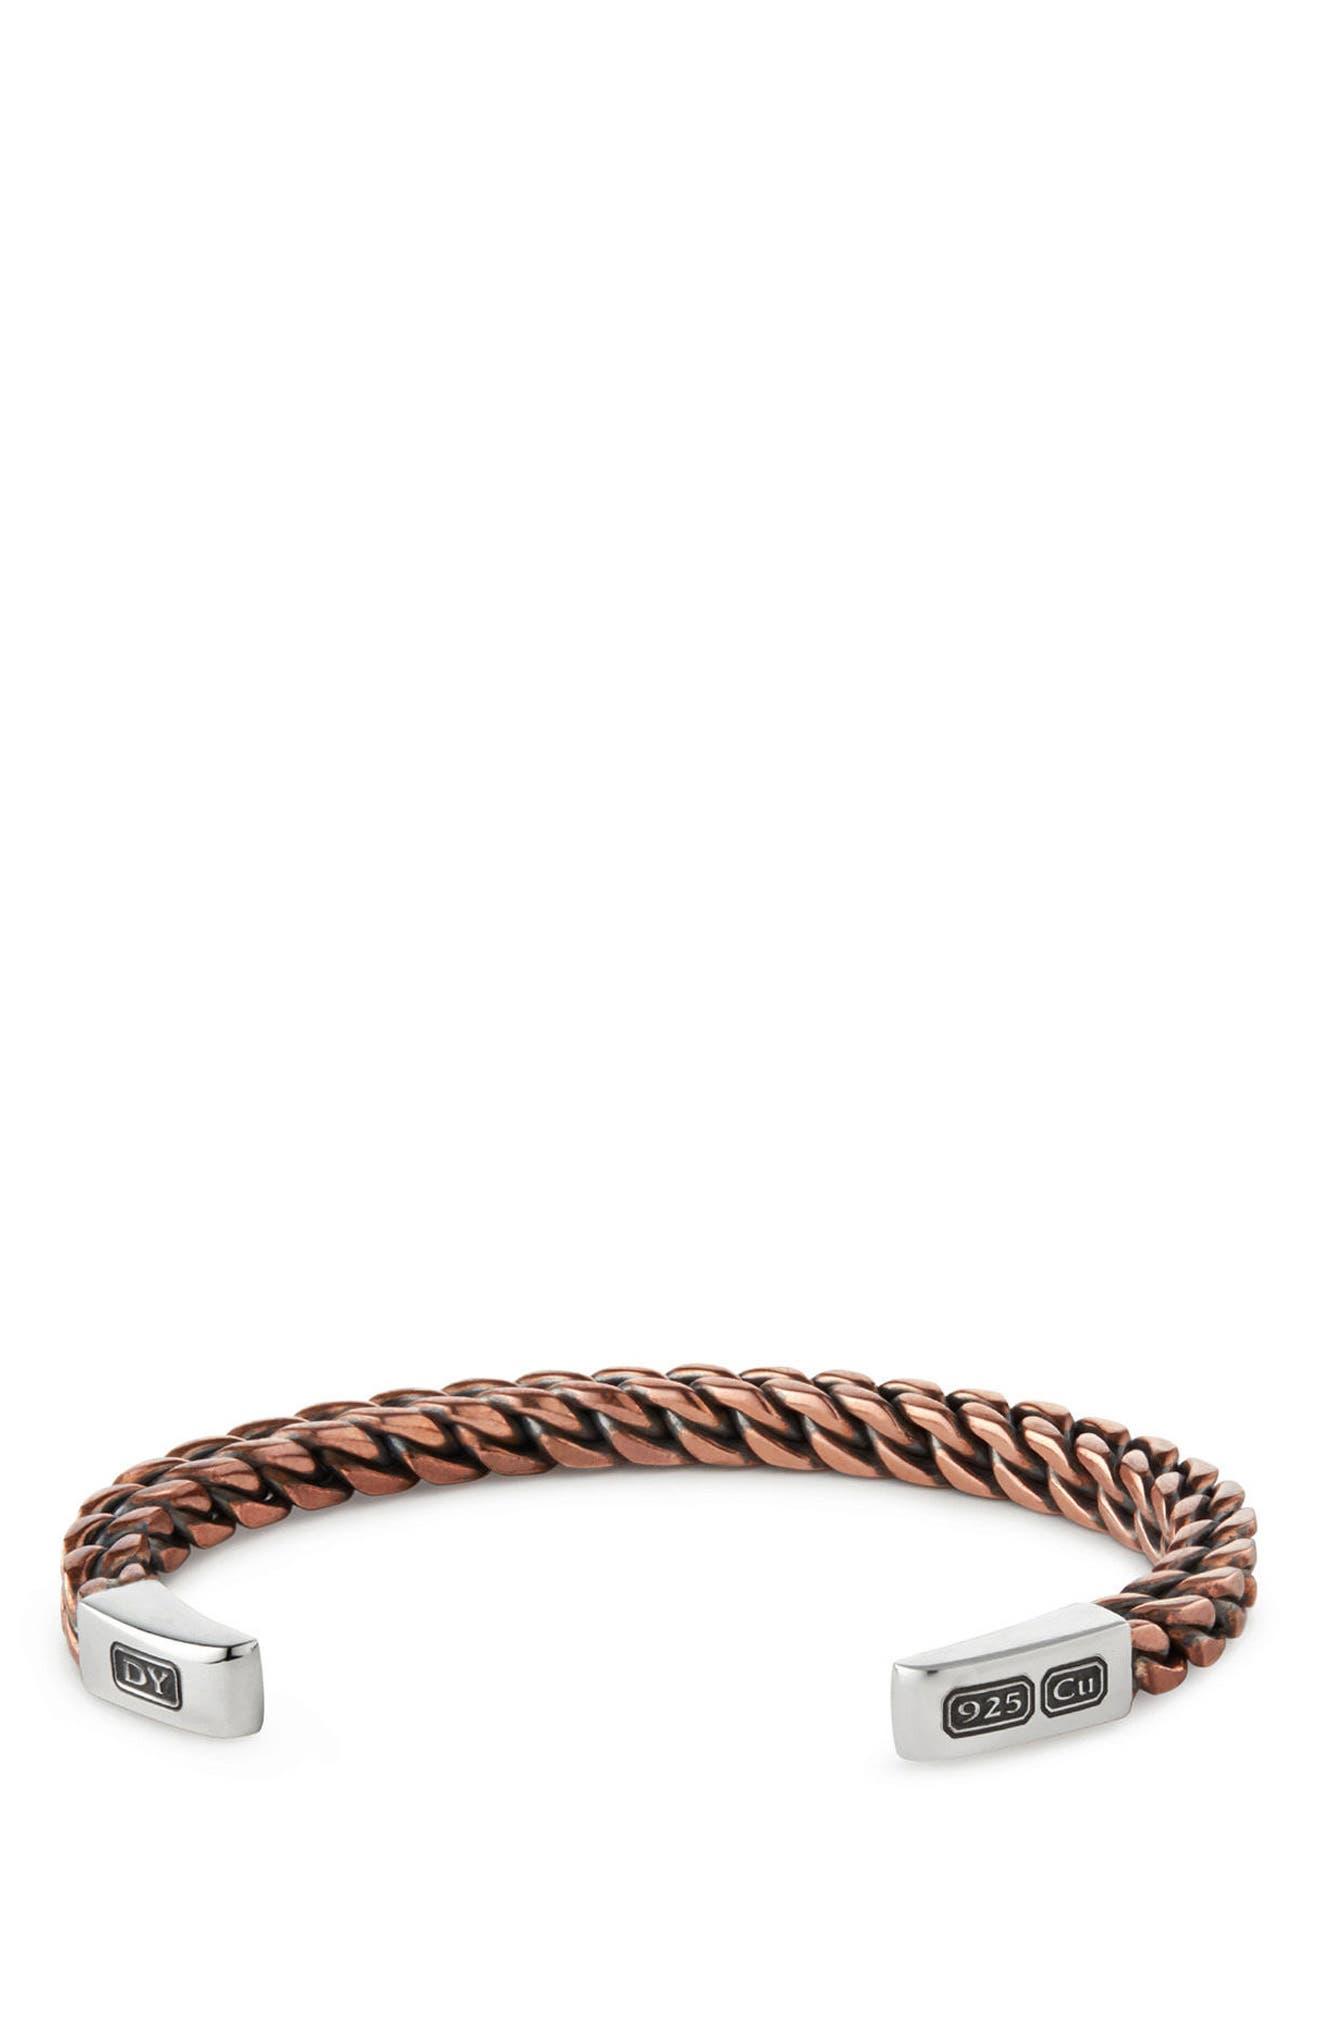 DAVID YURMAN Woven Cuff Bracelet